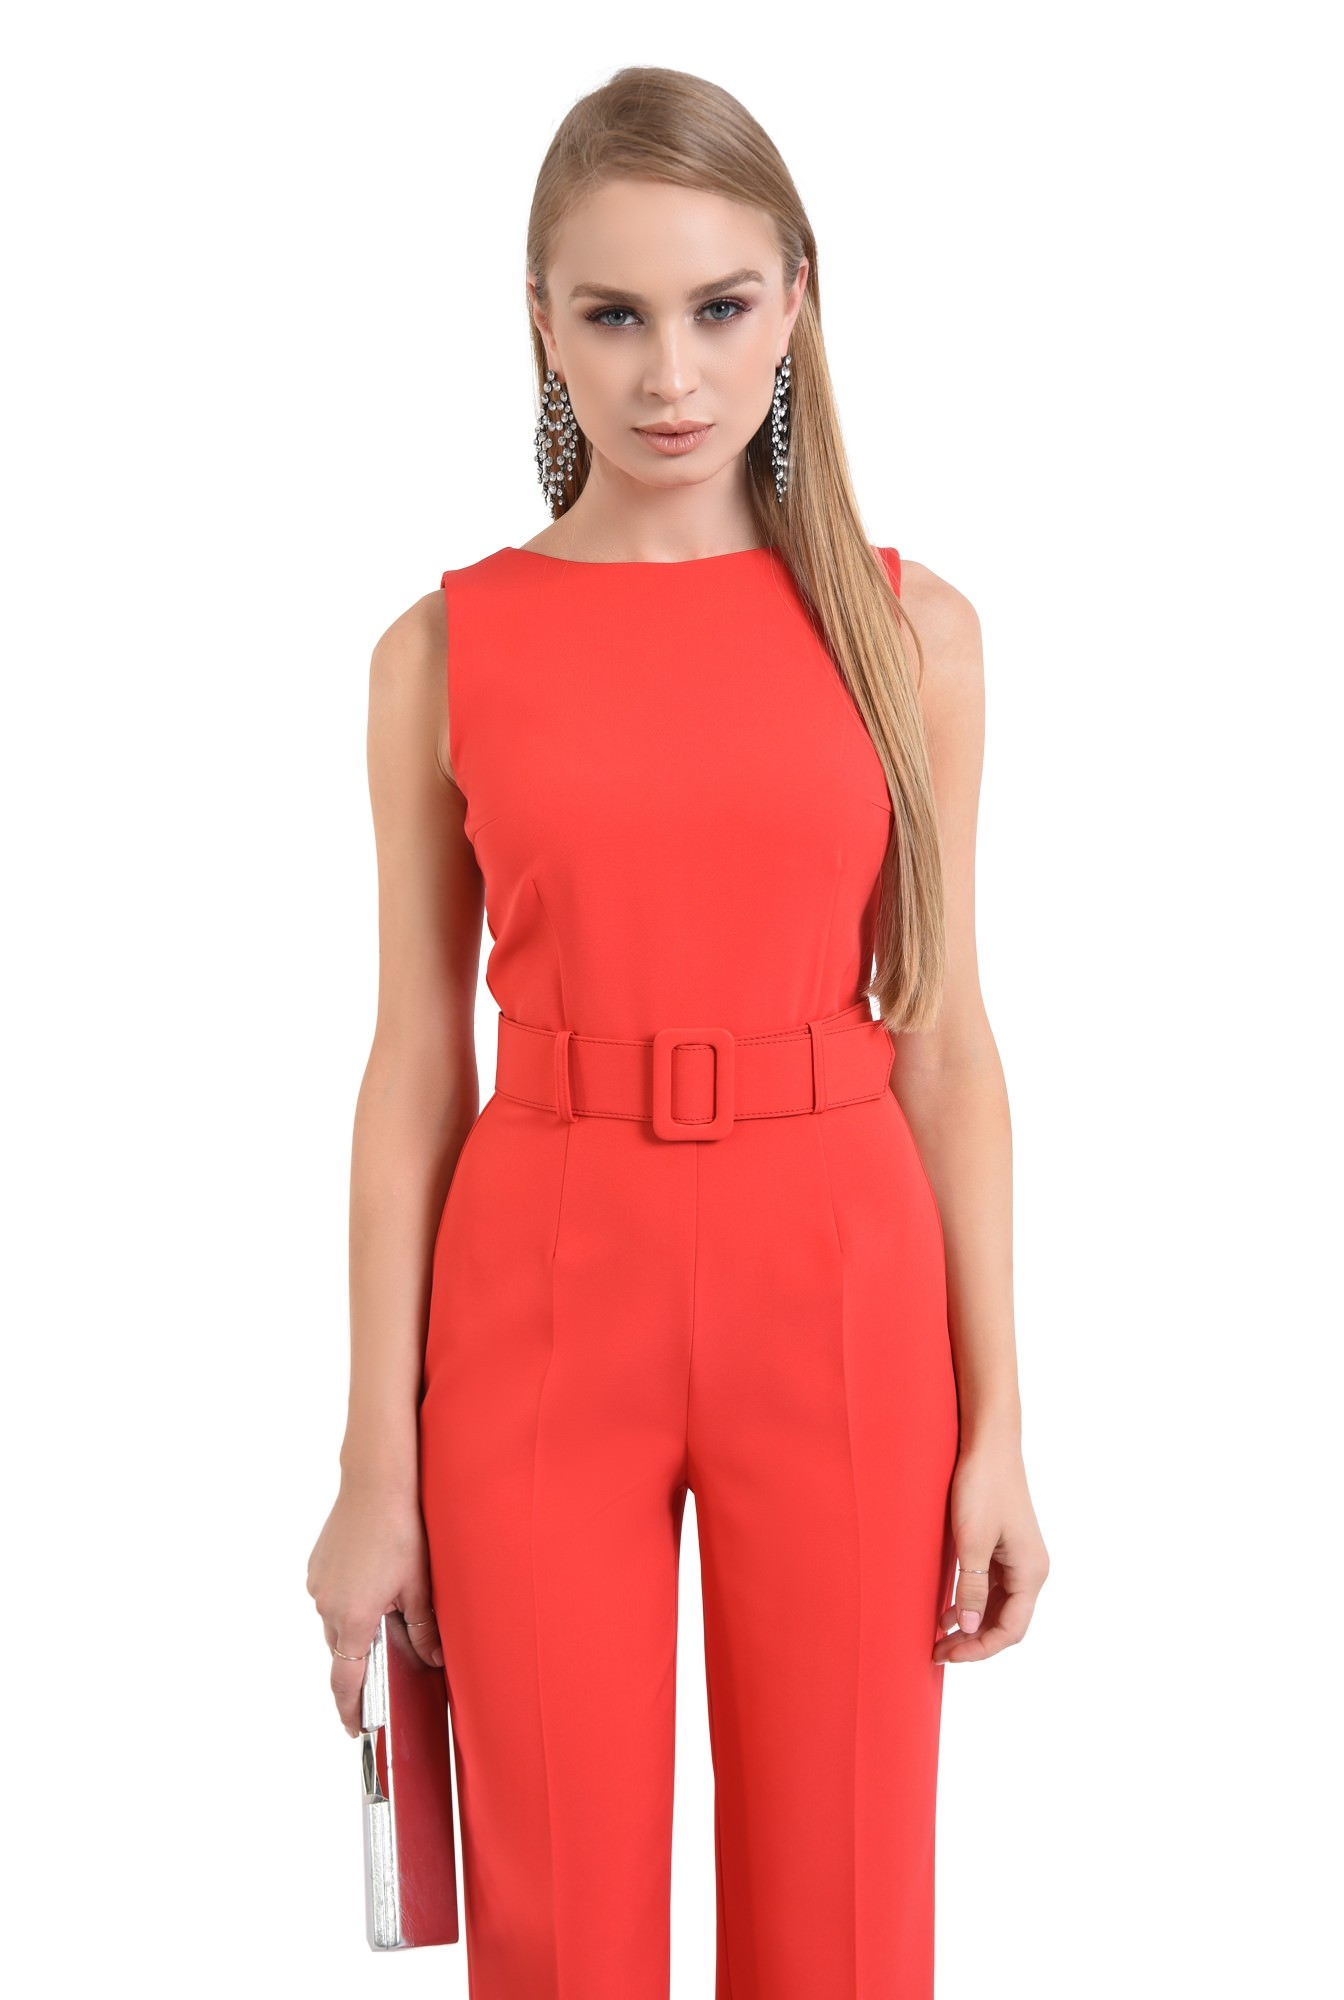 0 - salopeta eleganta rosie, curea lata, pantaloni la dunga